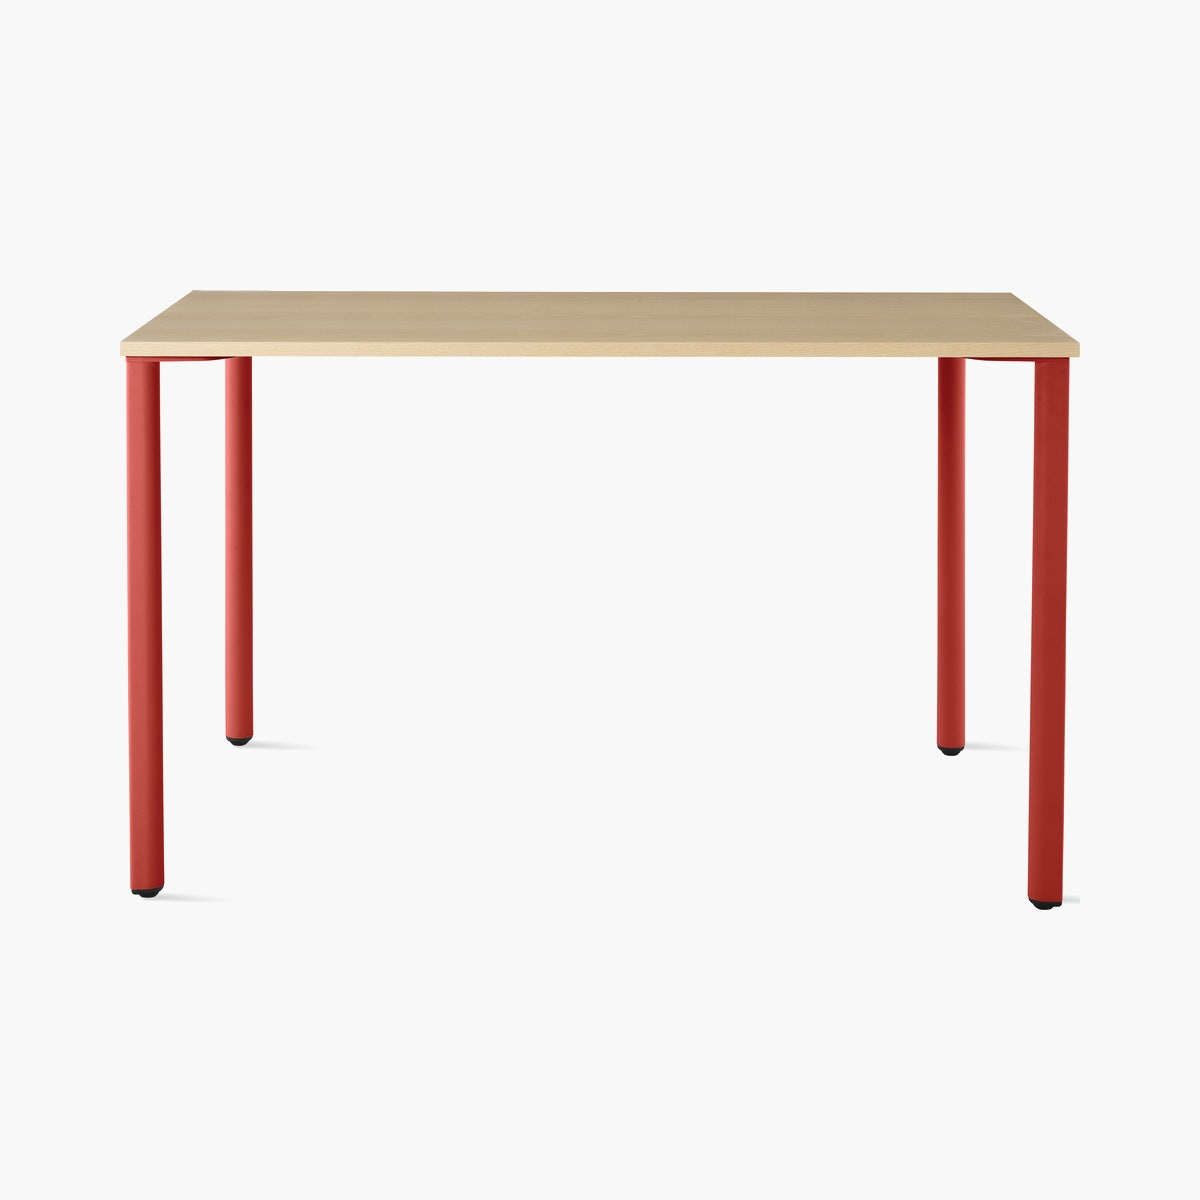 OE1 Table, 18 x 48